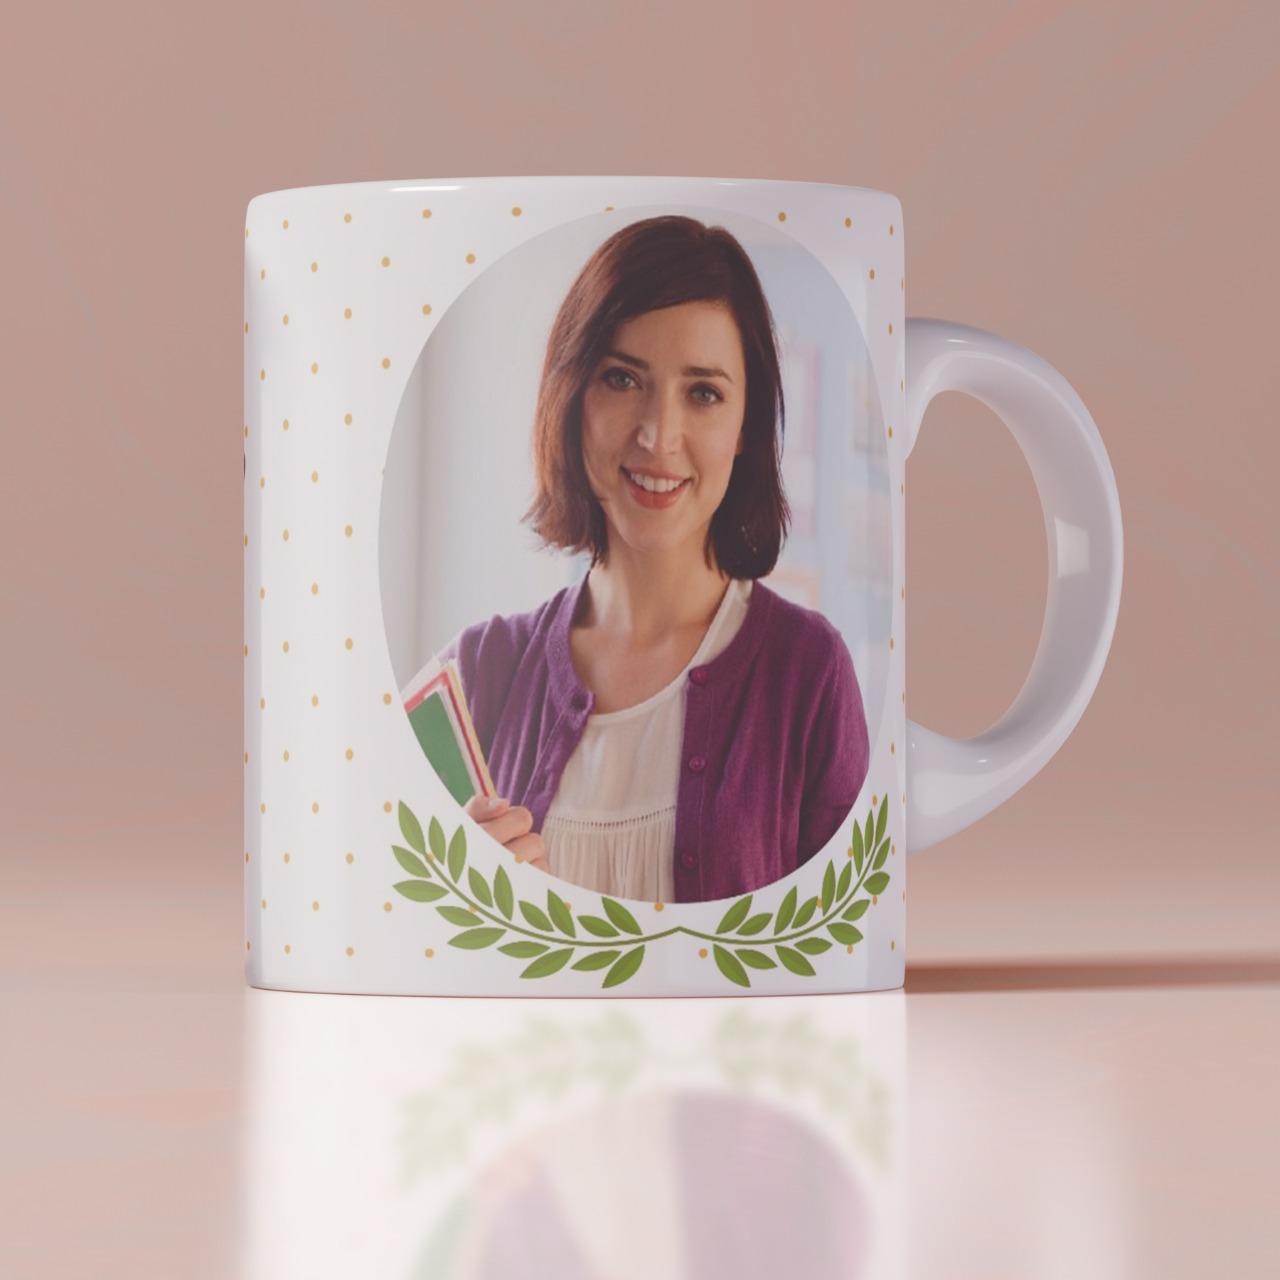 World Best Teachers Day Personalizd Mug